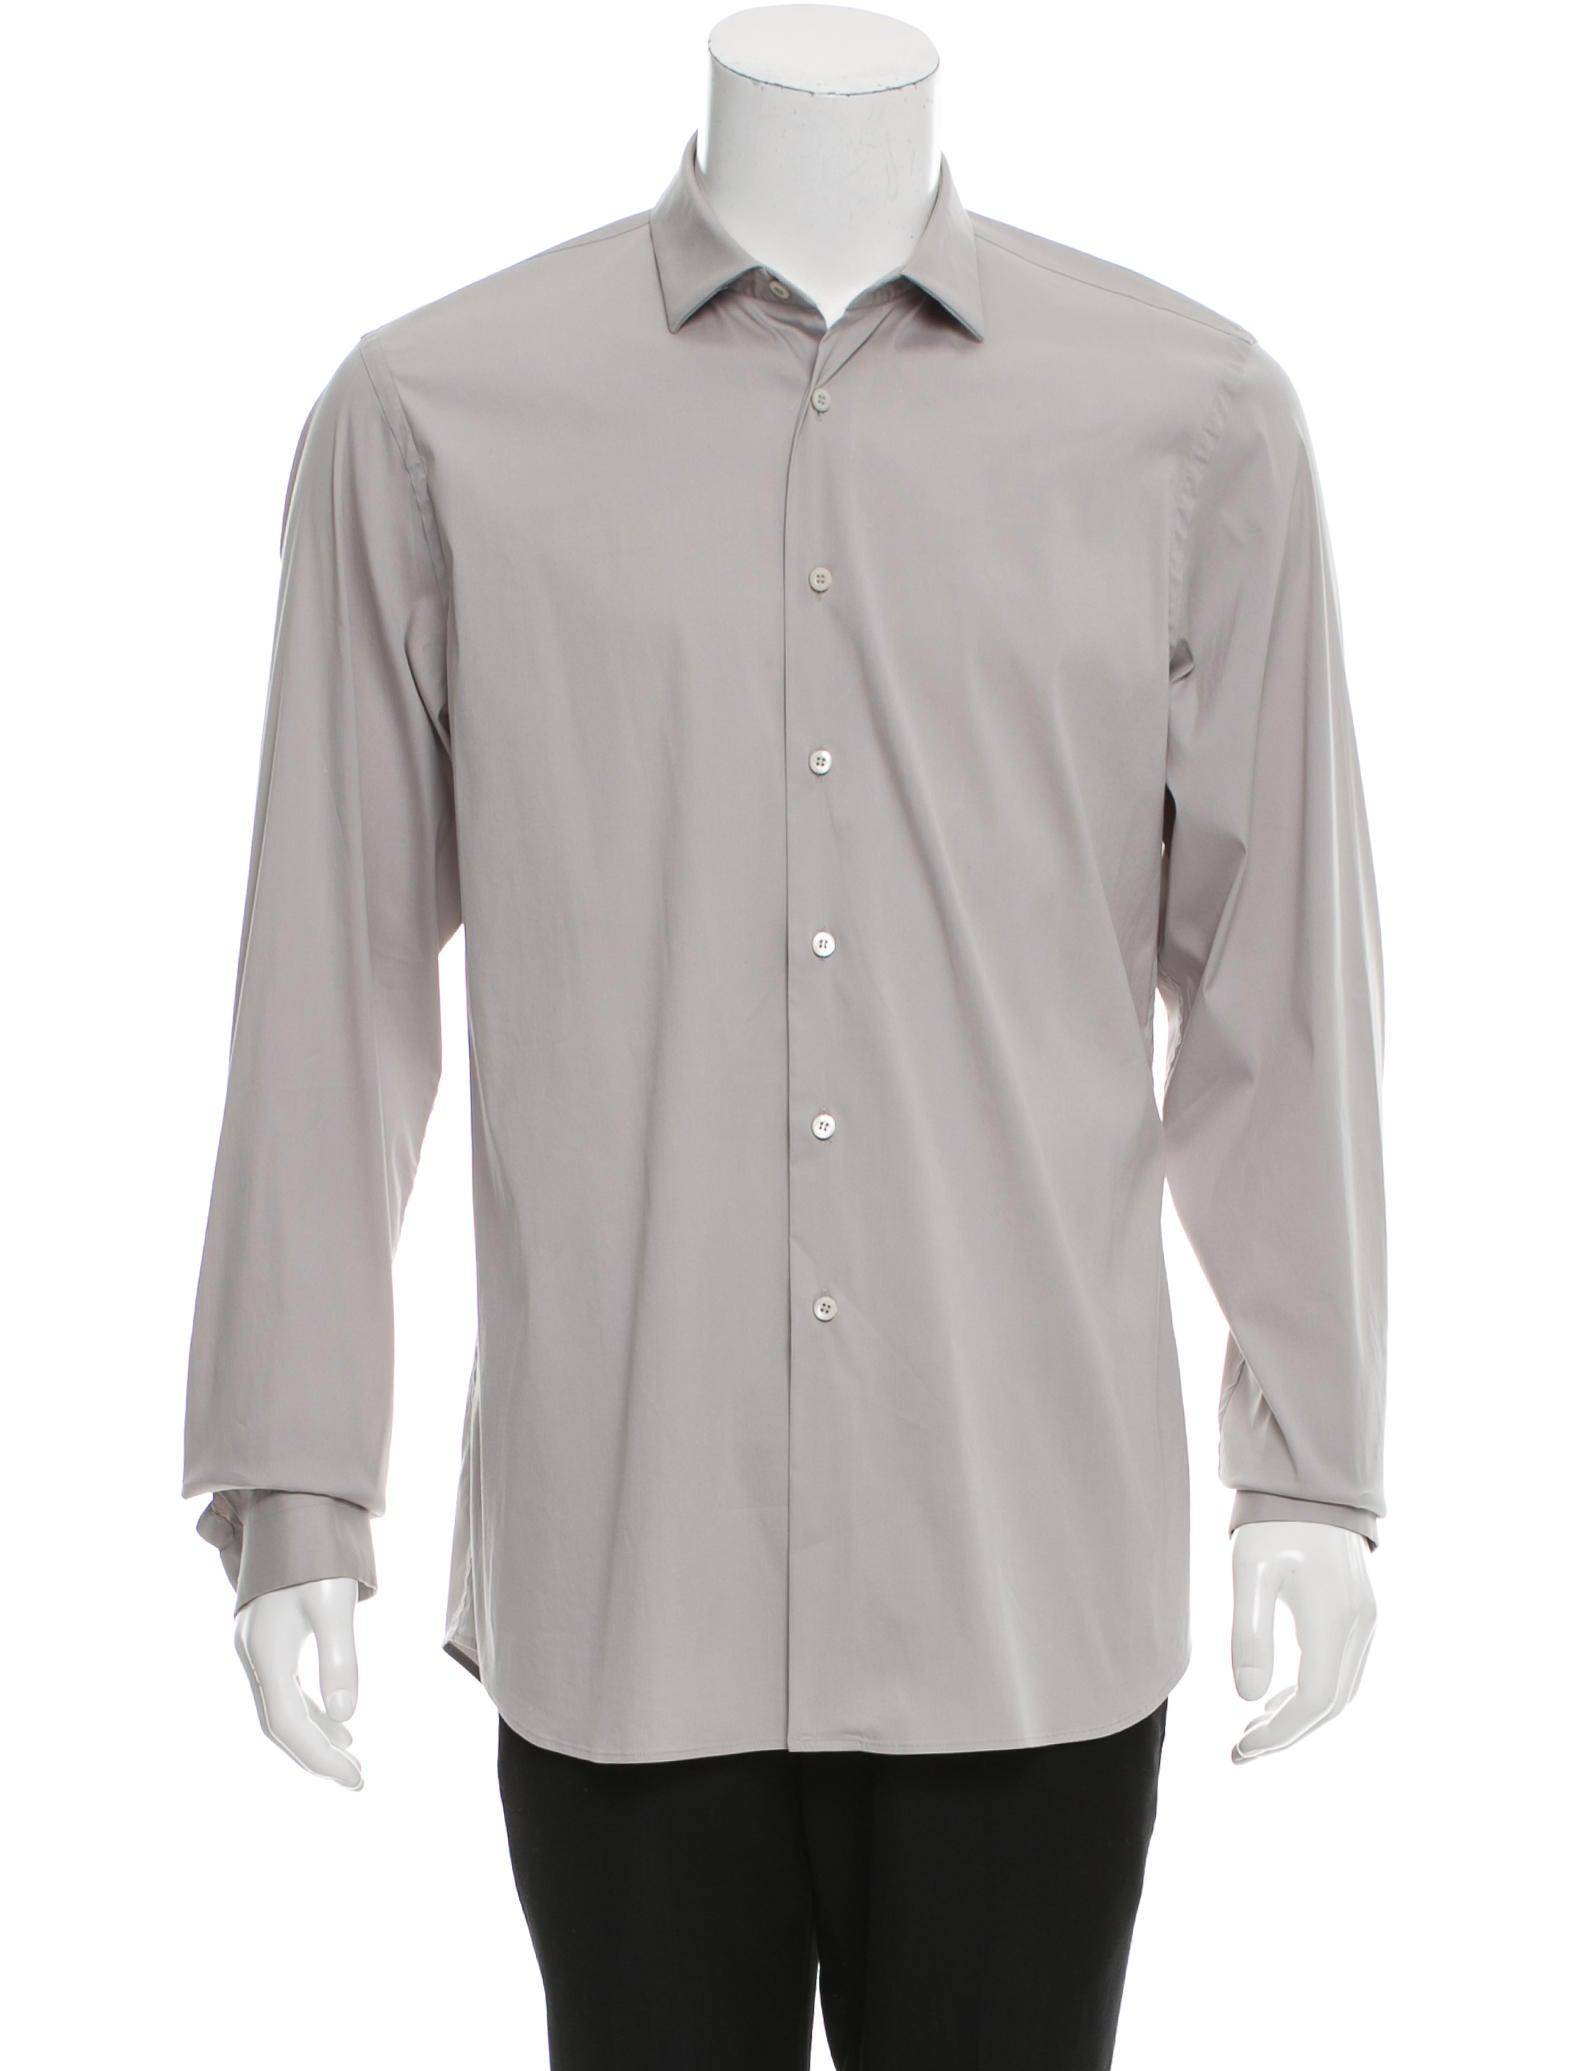 Prada button up poplin shirt clothing pra144787 the for What is a poplin shirt